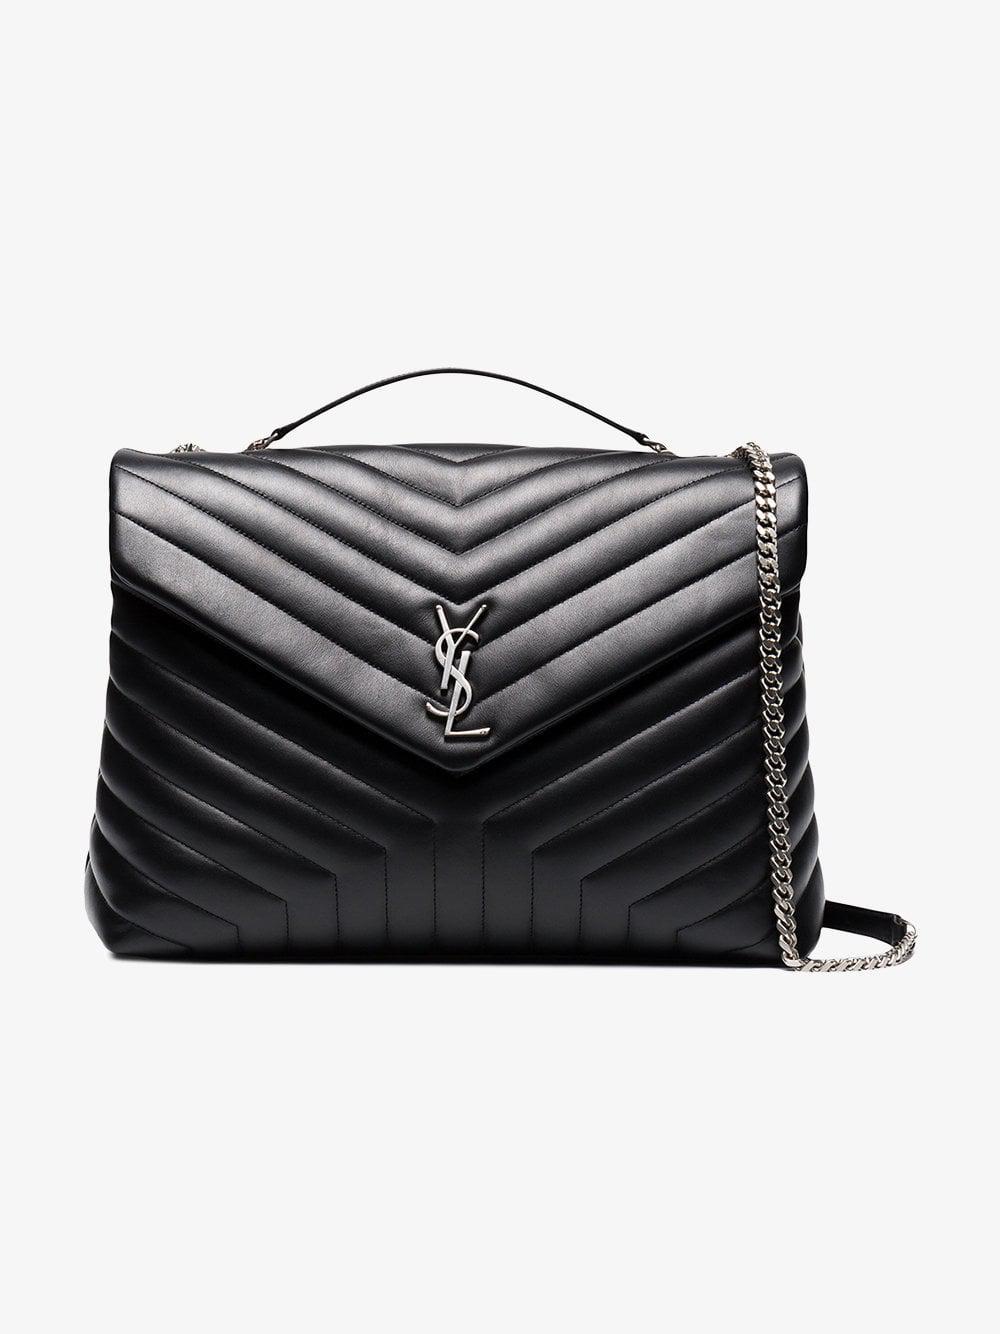 9773fa8c2 Saint Laurent Loulou Quilted Leather Shoulder Bag in Black - Lyst